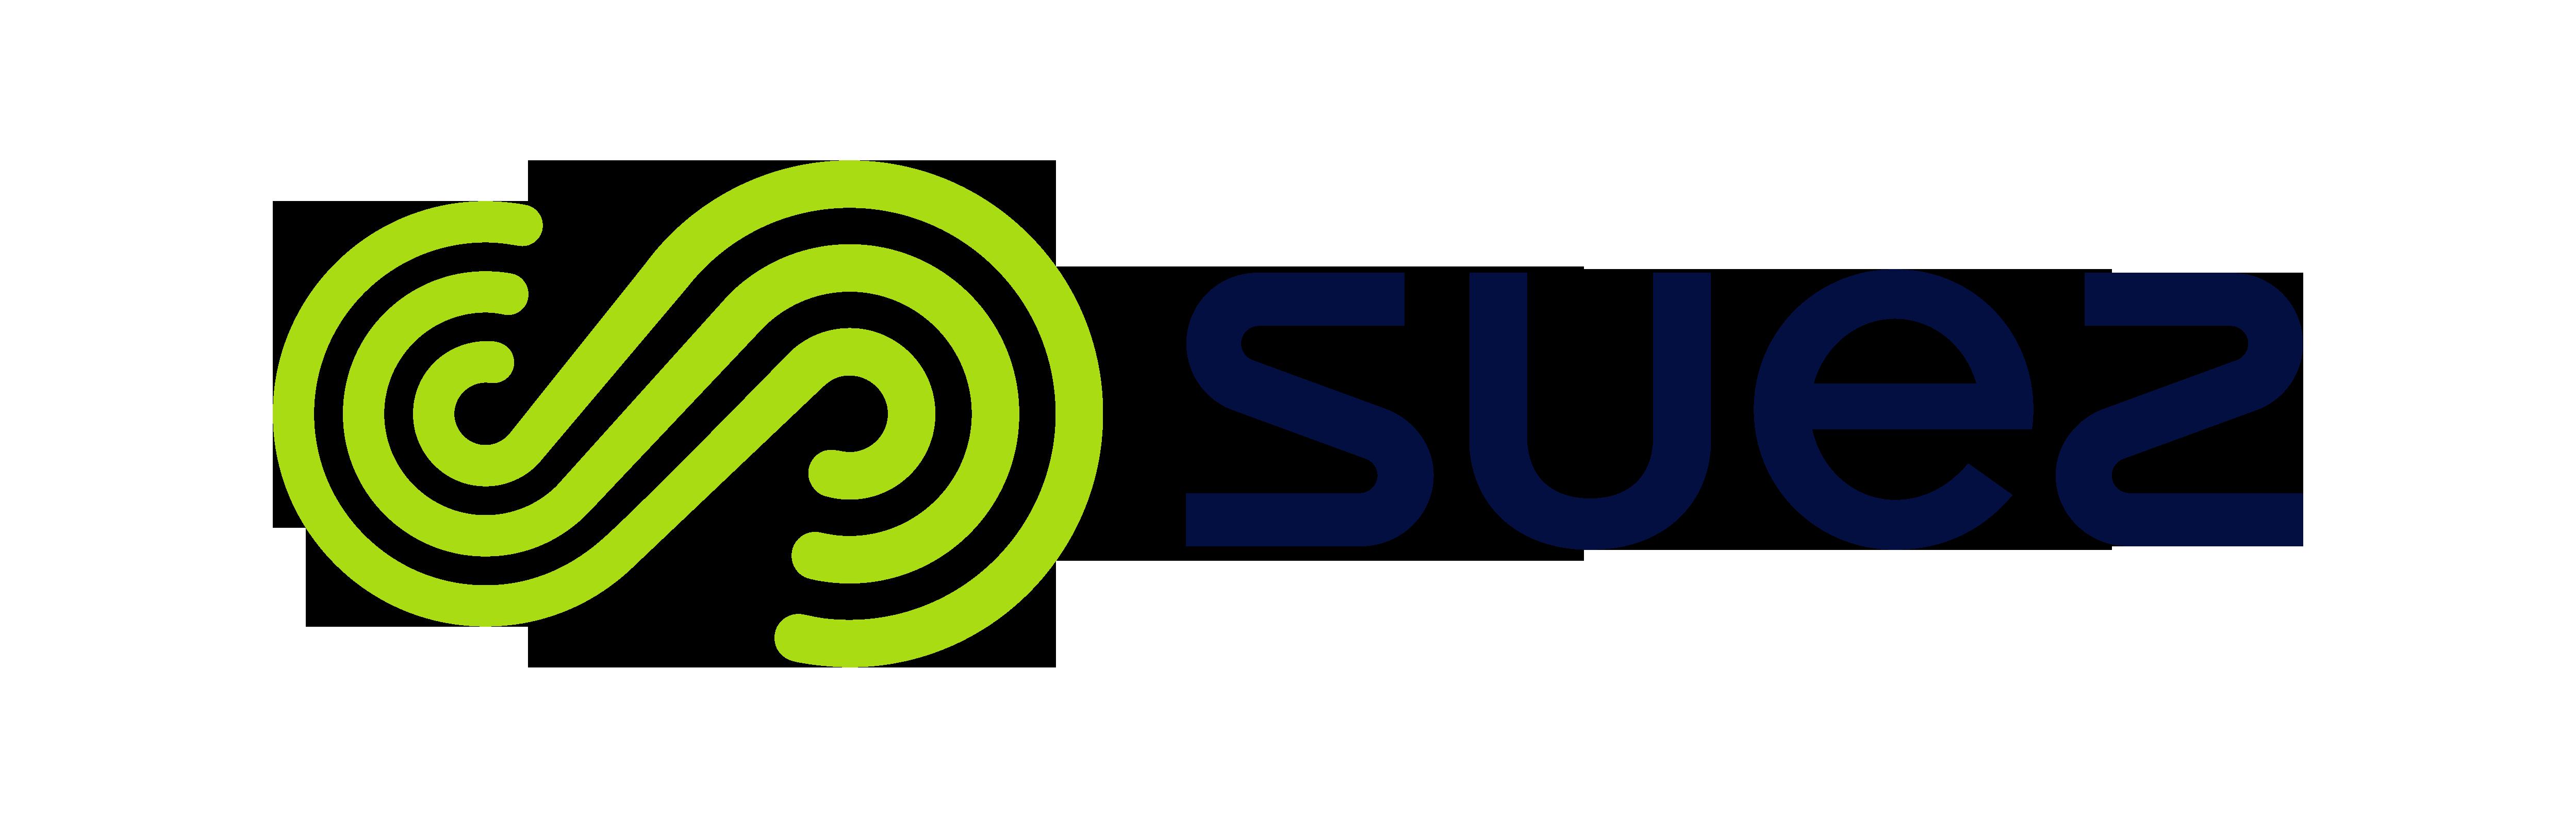 Logo of Suez environmental waste company